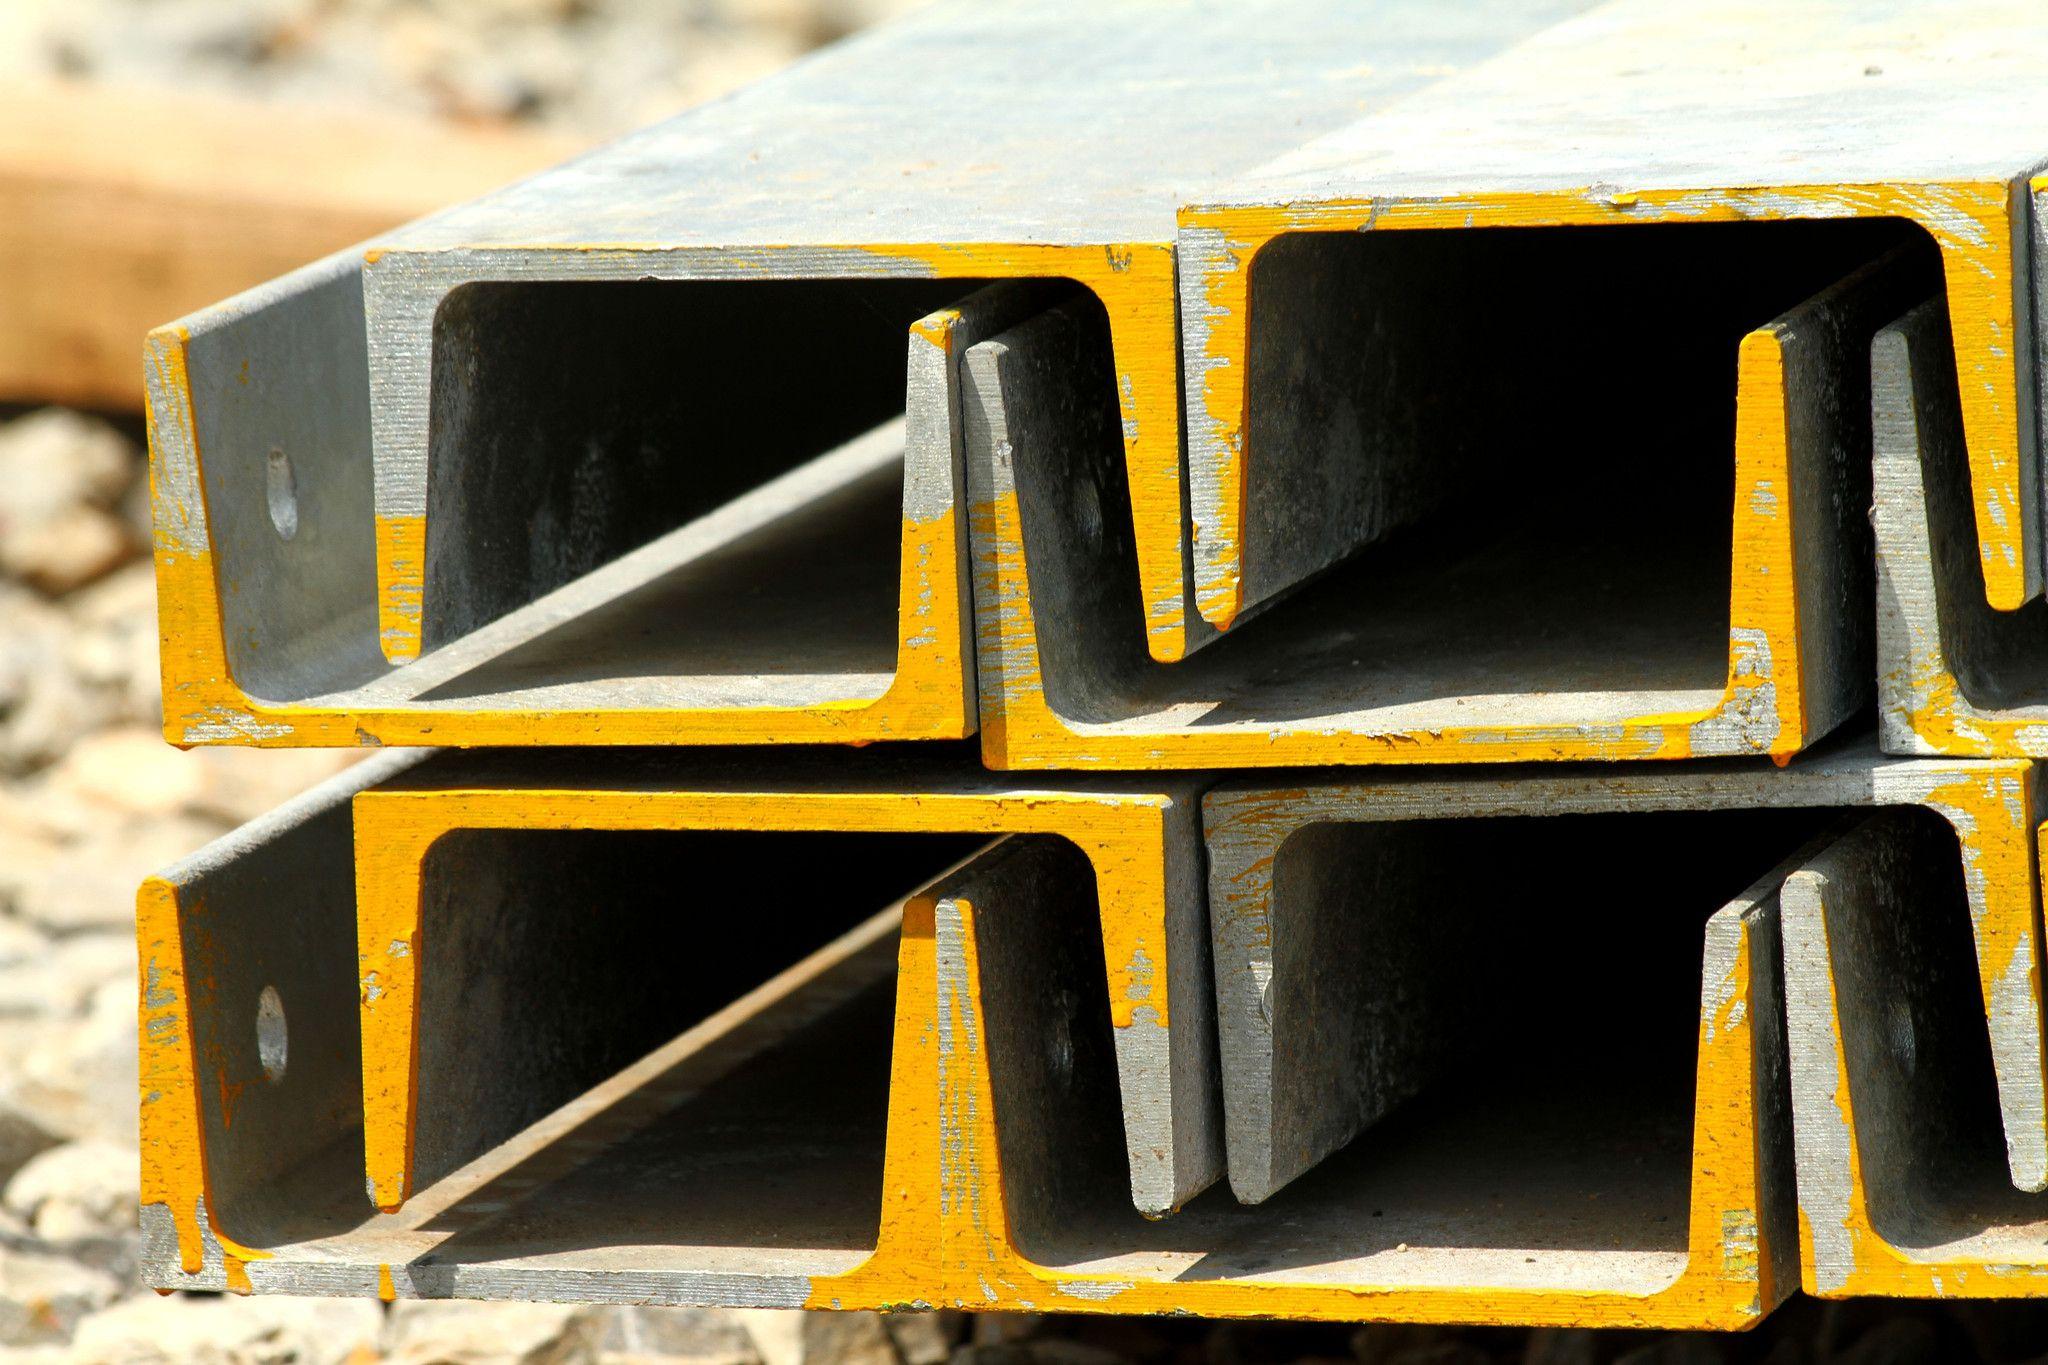 200 X 90 X 30 Pfc Channels Steel Fabrication Steel Beams Beams